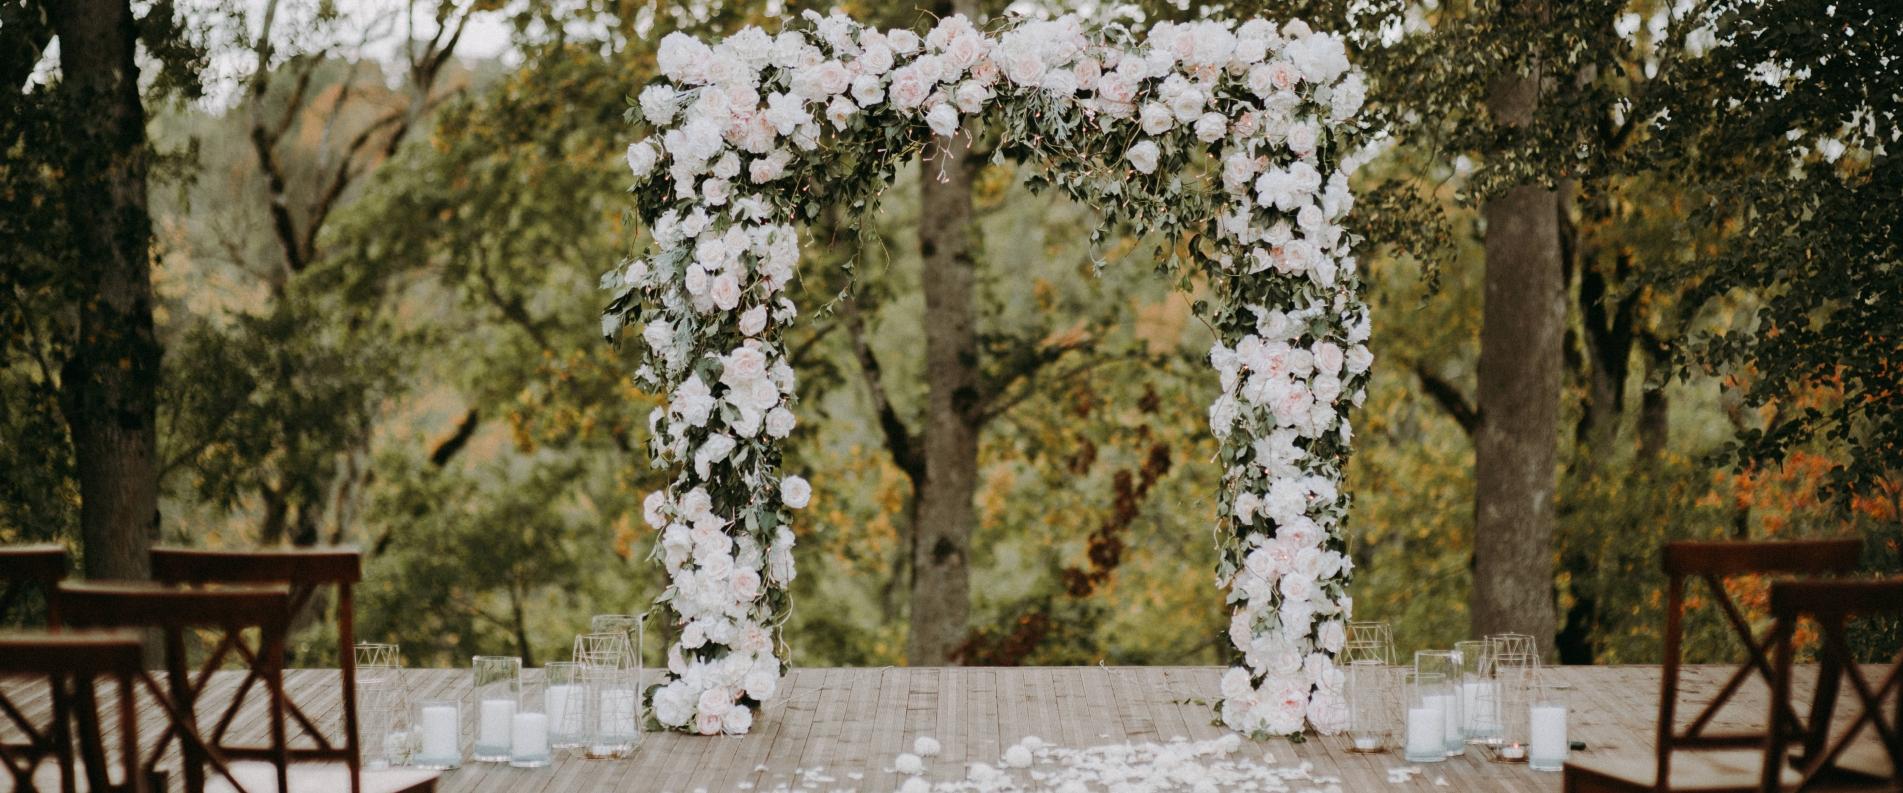 dace-haralds-by-miks-sels-weddings-197_6081-12cf5160bfc3ab645b83ed42a2cb3010.jpg